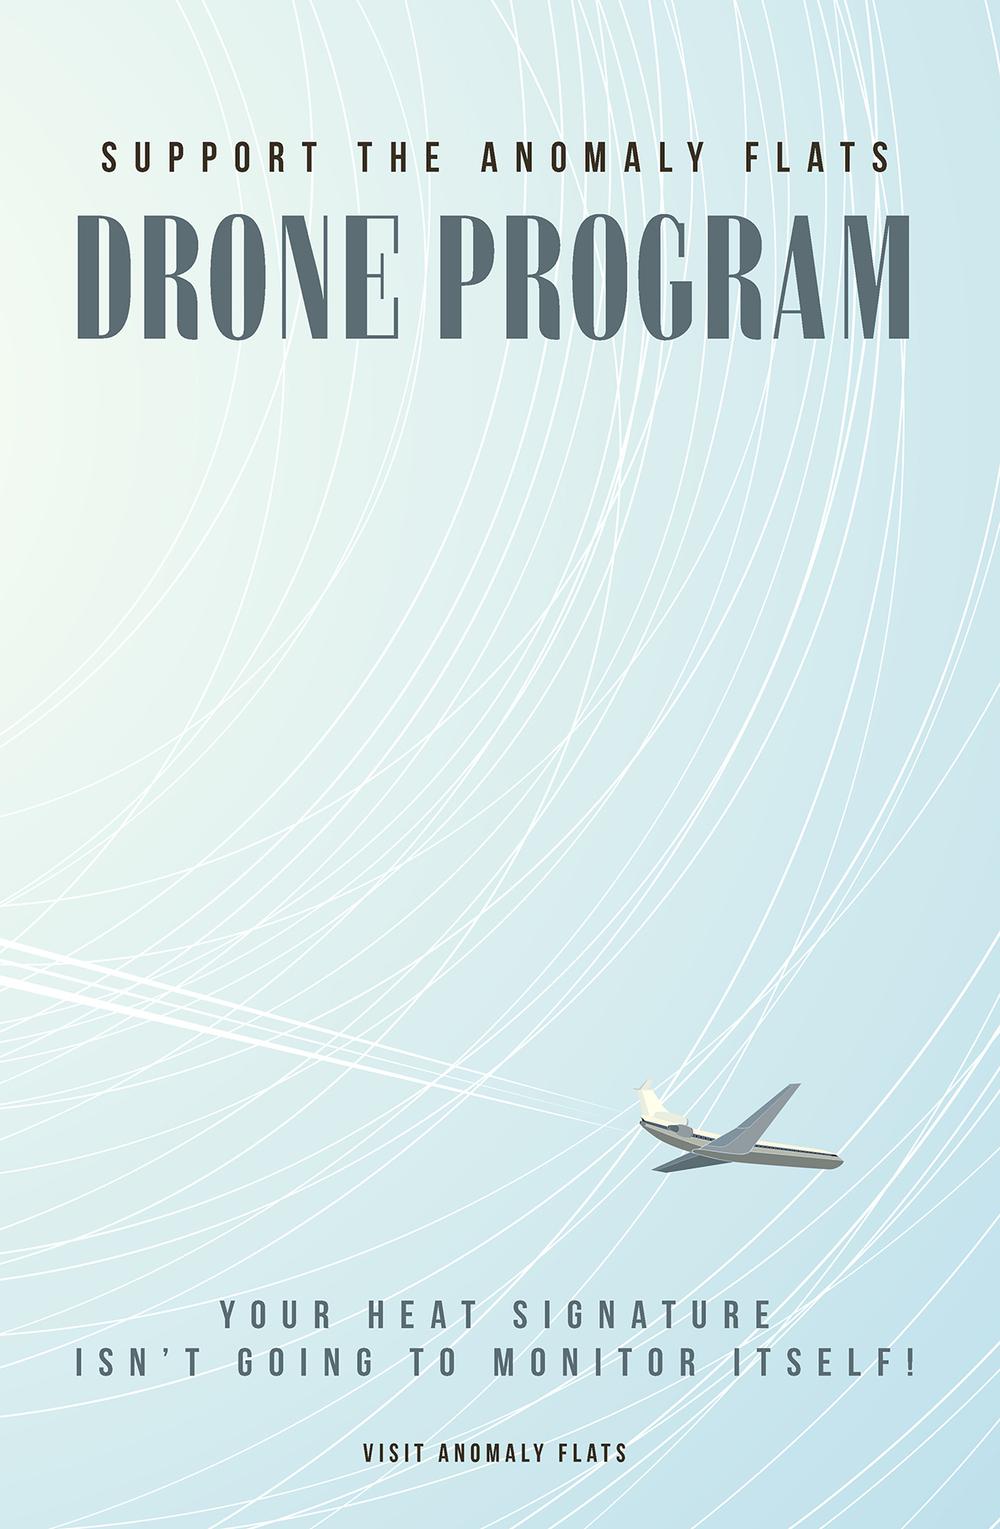 drone program.jpg